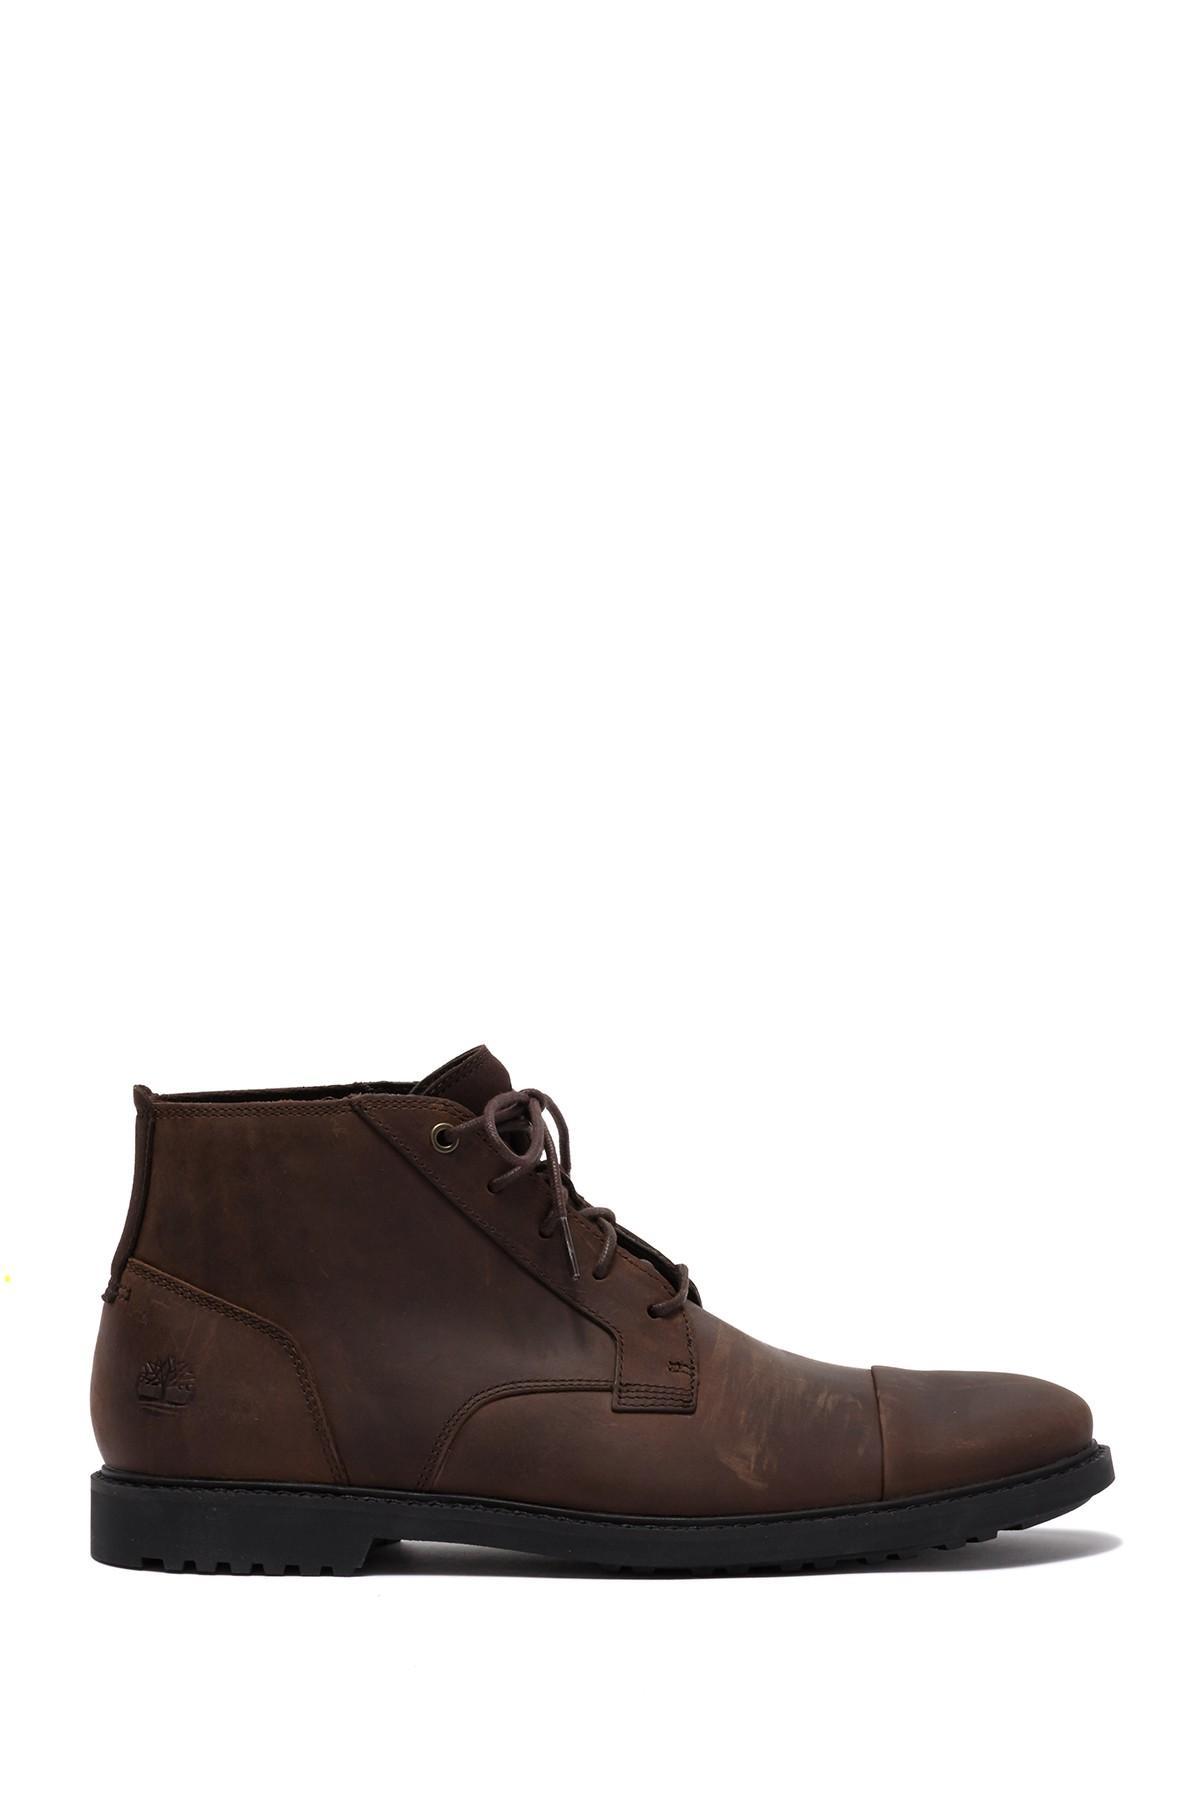 Timberland Lafayette Cap Toe Leather